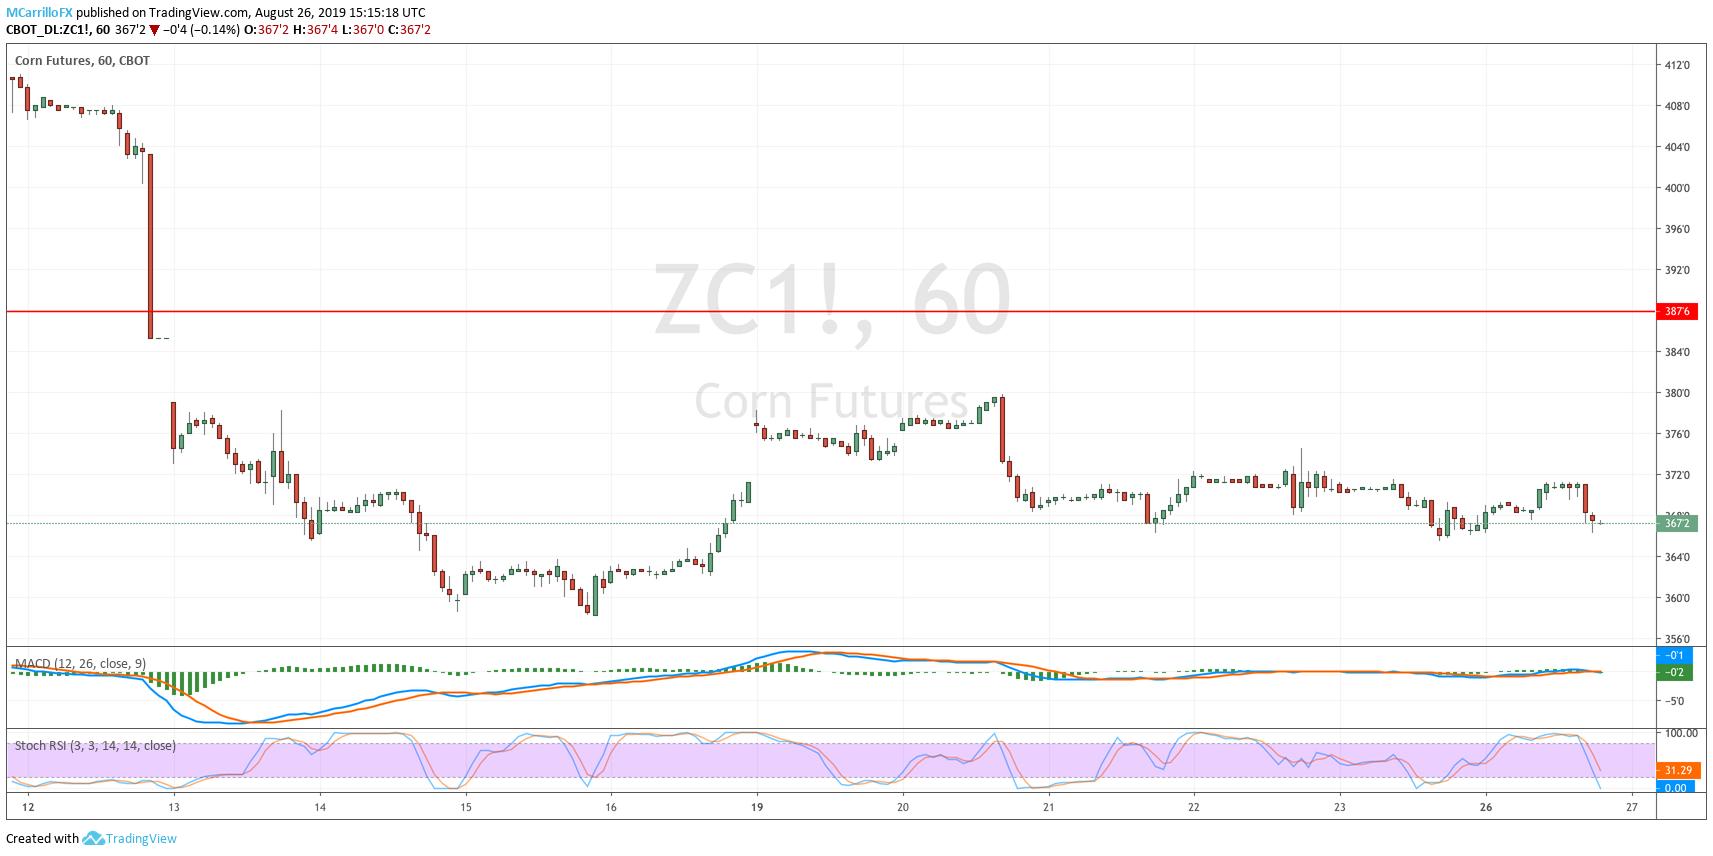 ZC1 Futures Corn 1-hour chart August 26